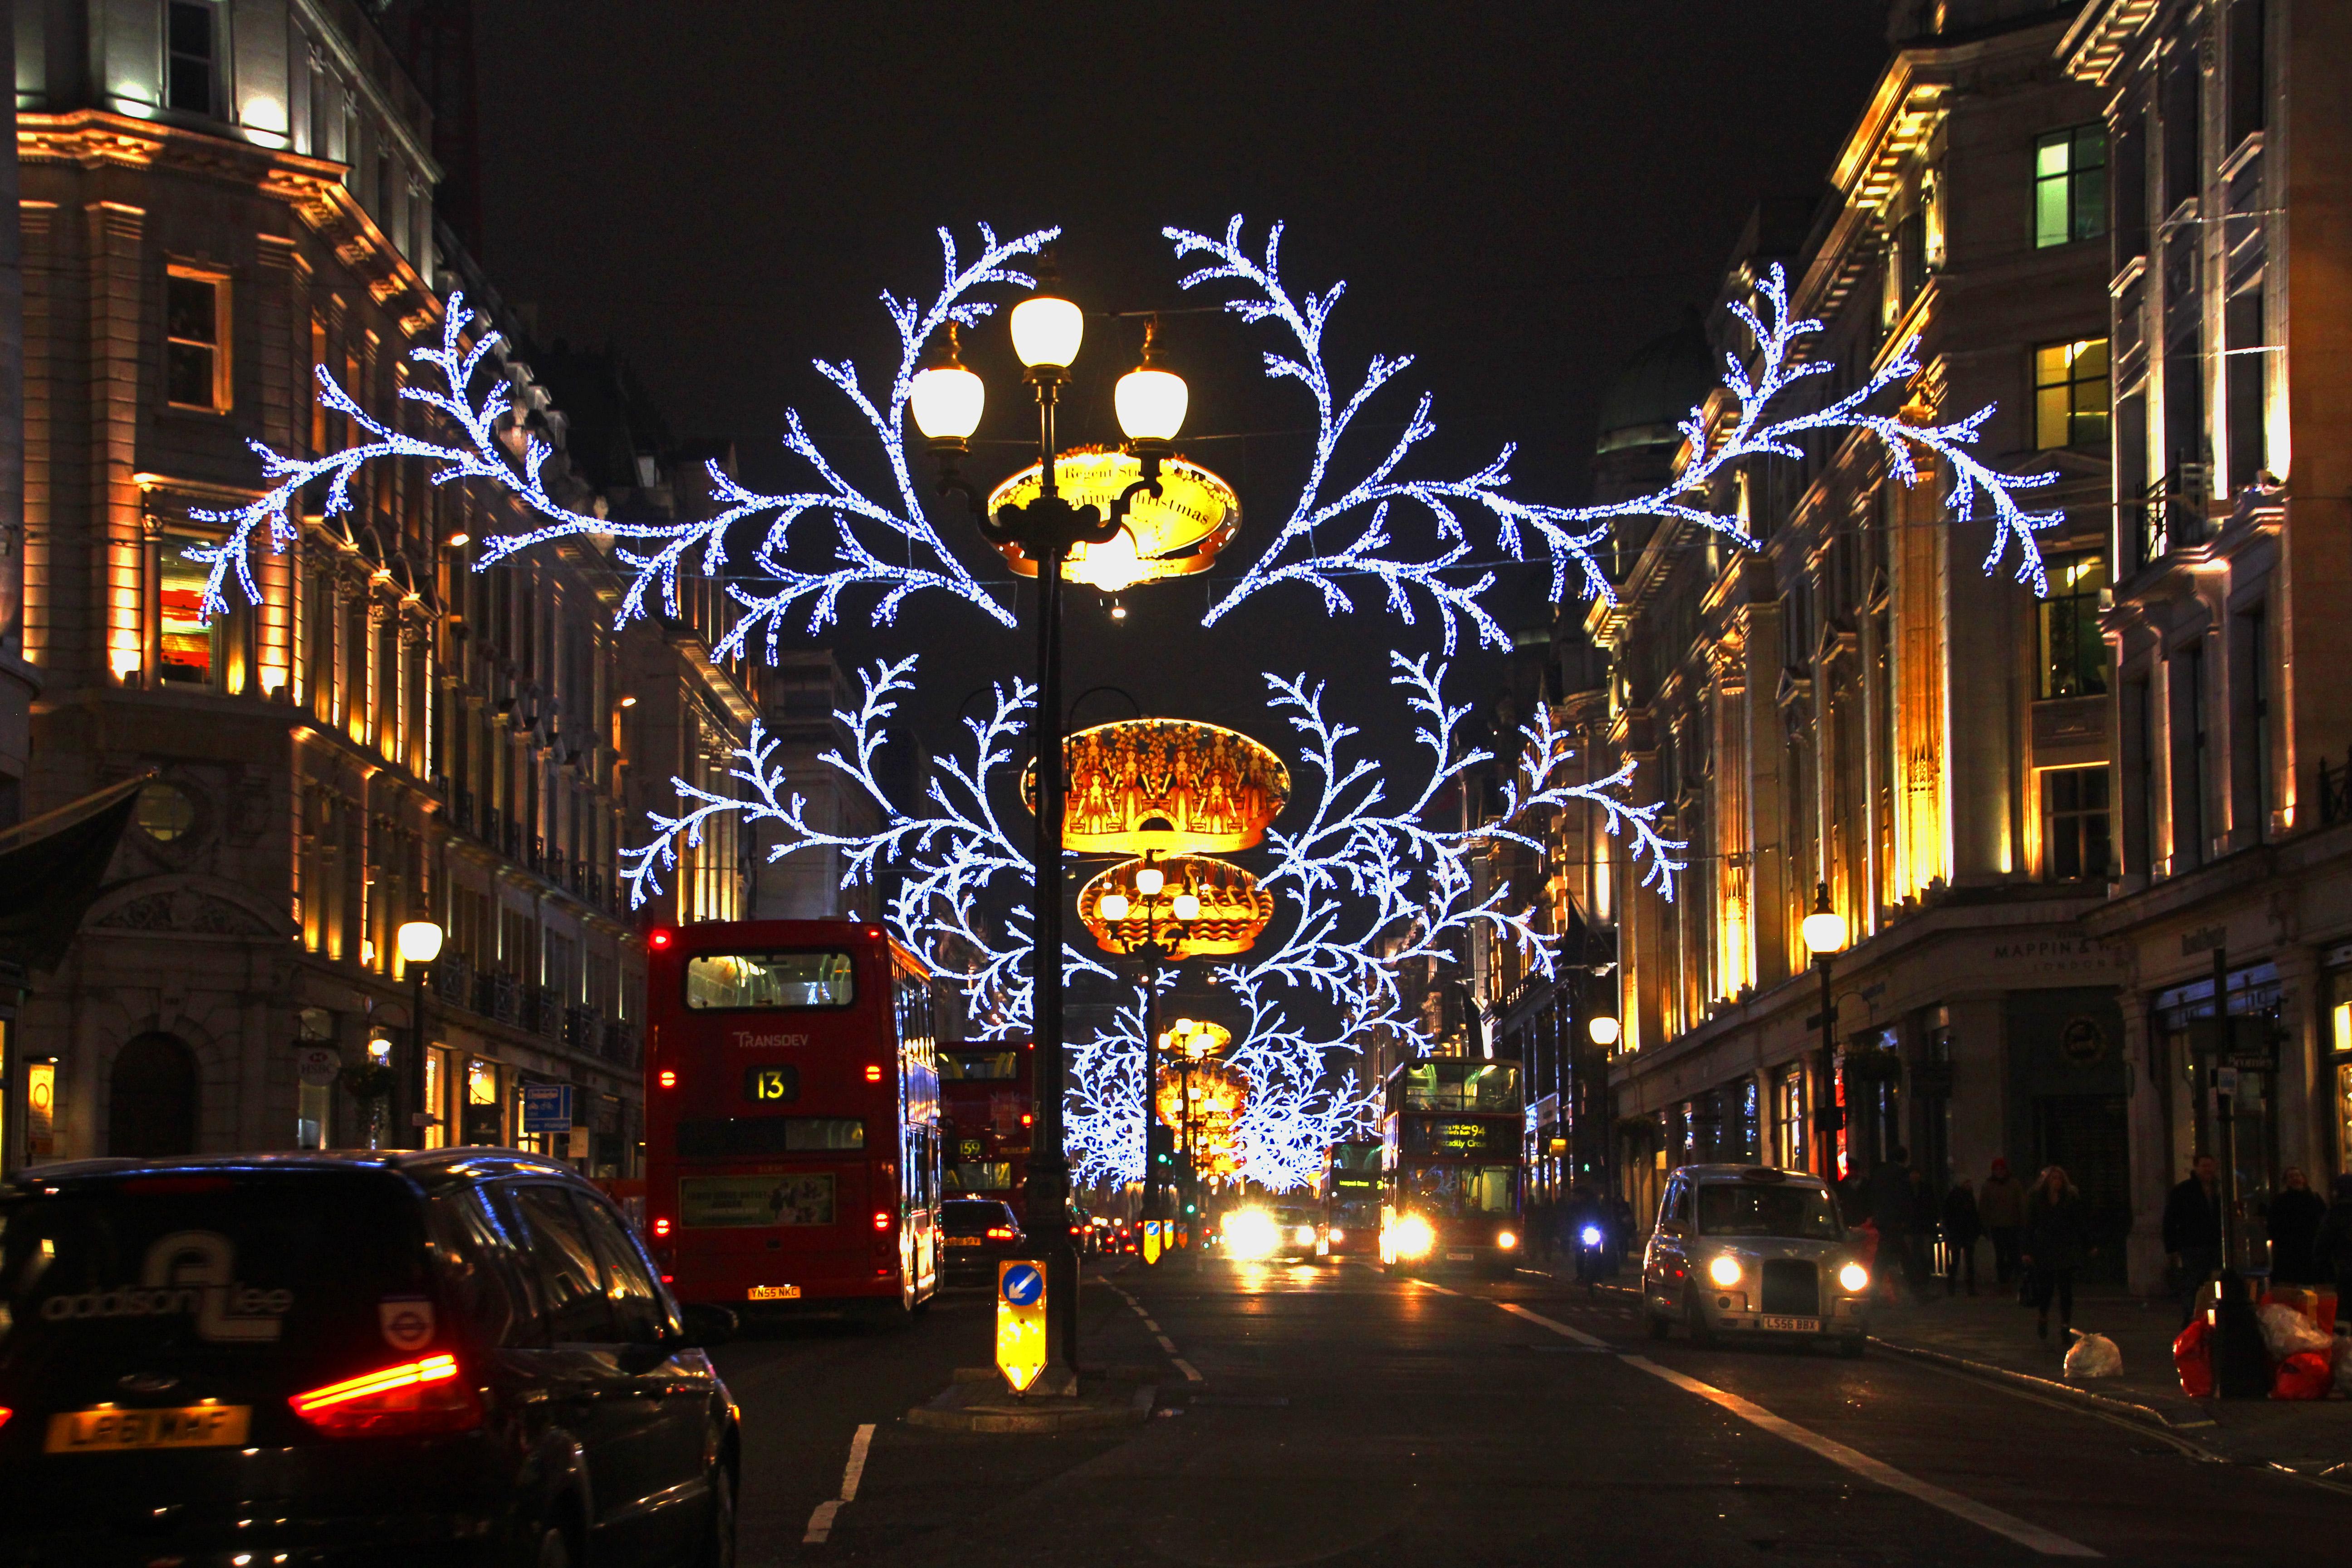 Regent Street Xmas Traffic © jonovernon-powell